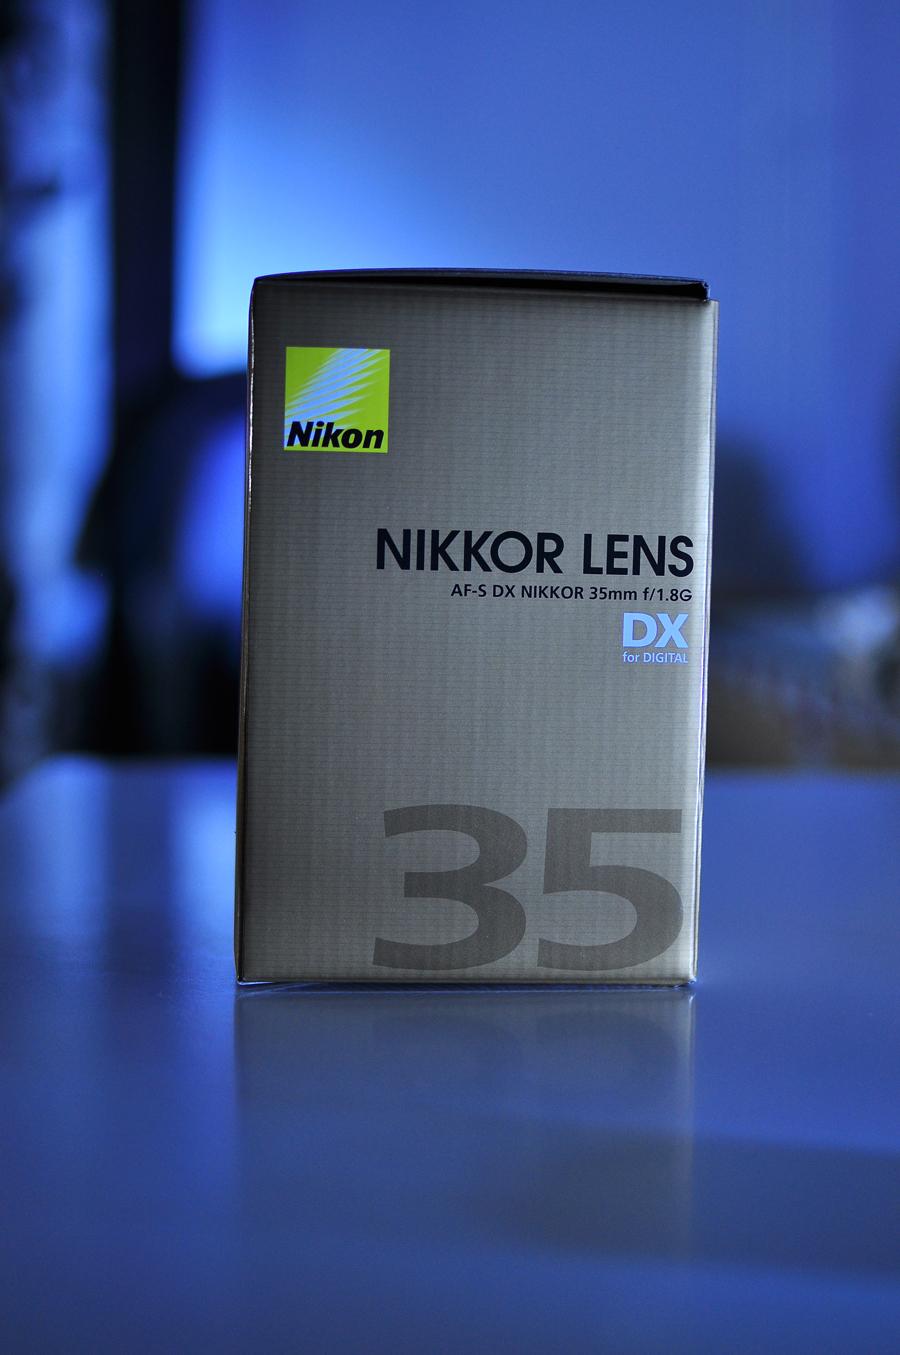 Nikon 35mm DX